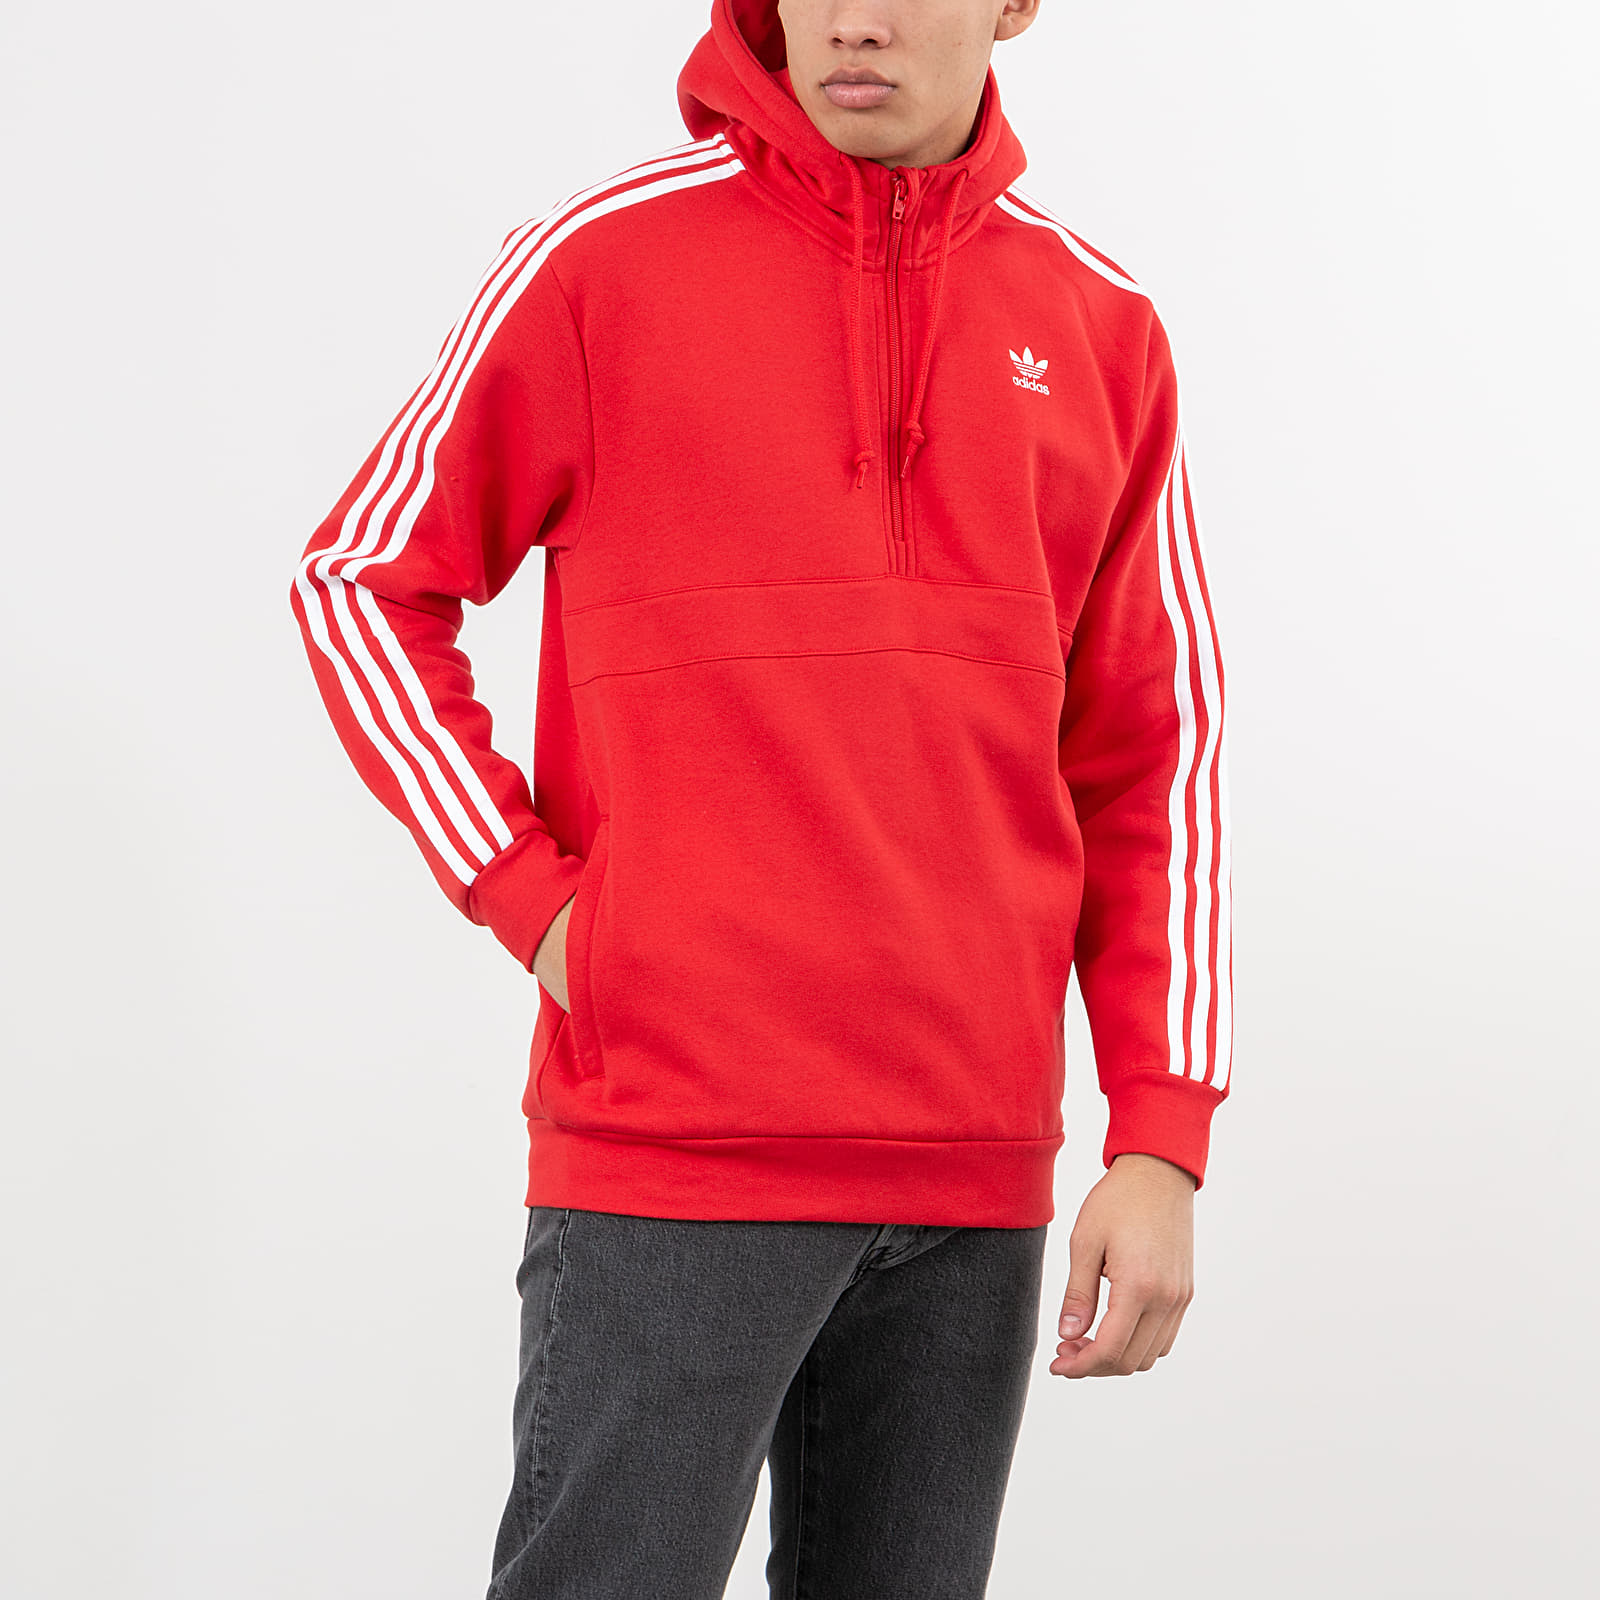 adidas 3-Stripes Half Zip Sweatshirt